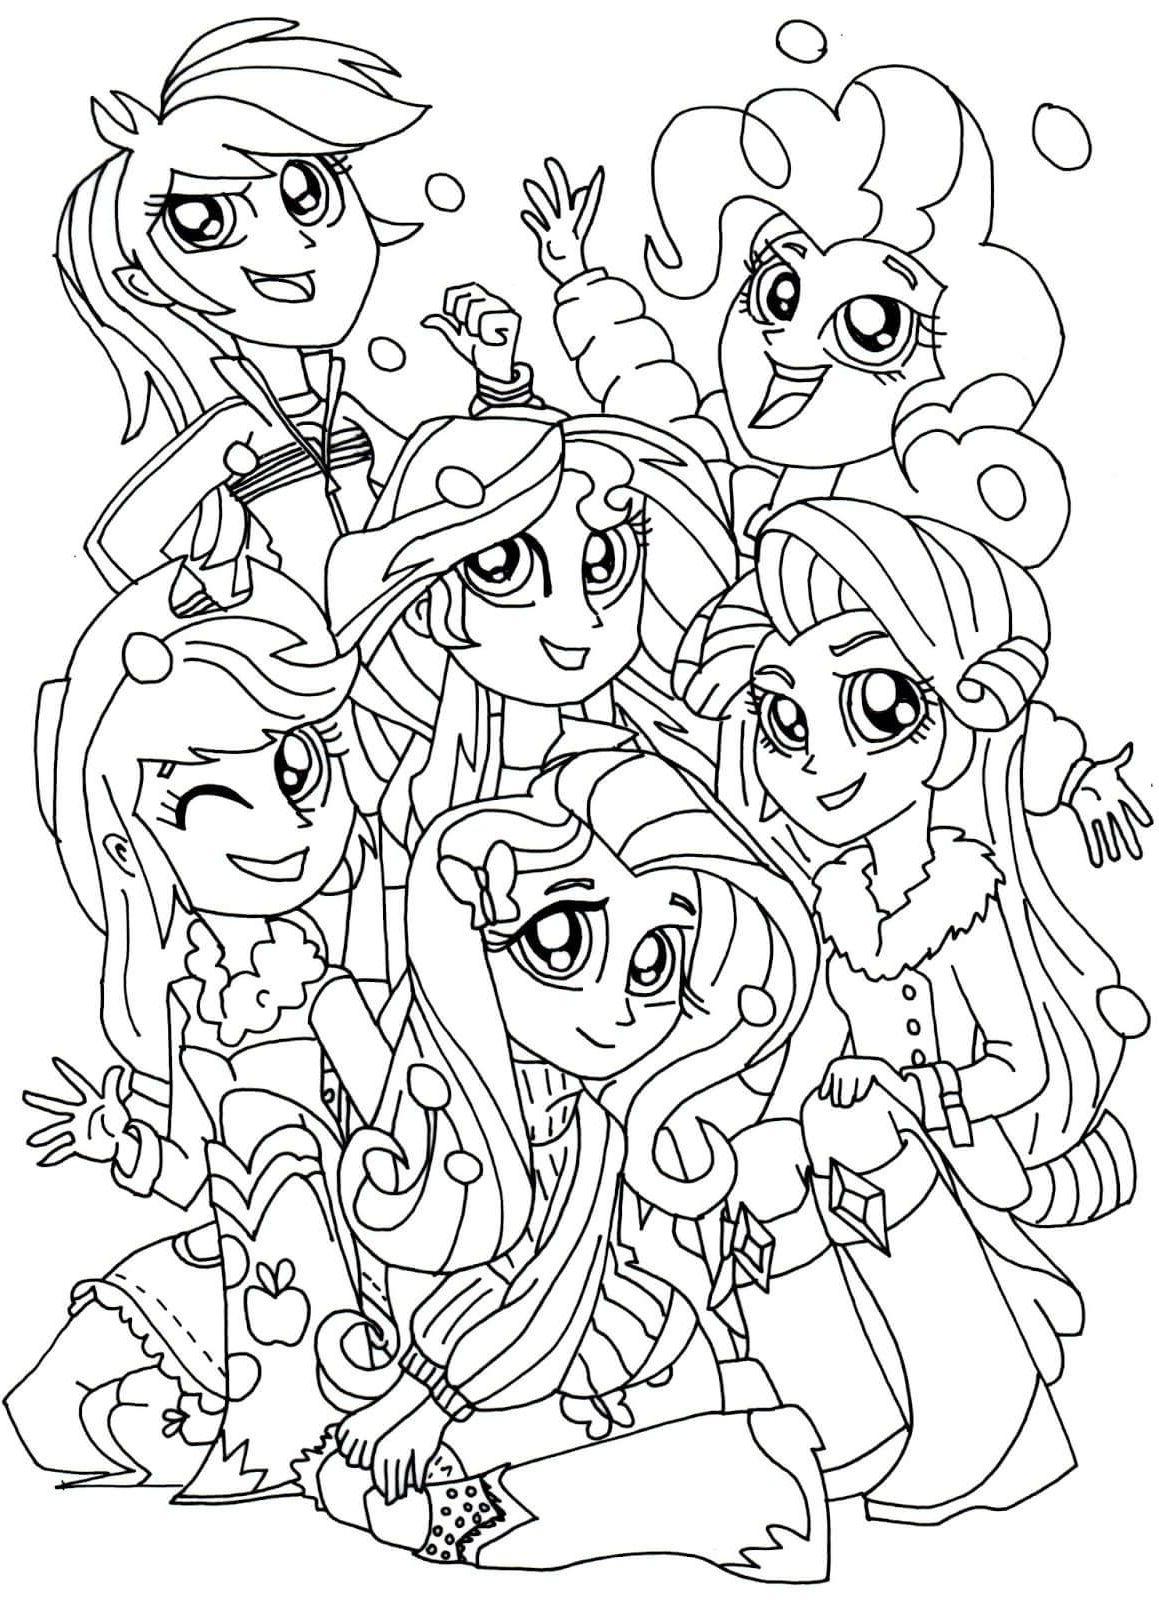 Equestria Girls Coloring Pages Buku Mewarnai Kuda Poni Poni